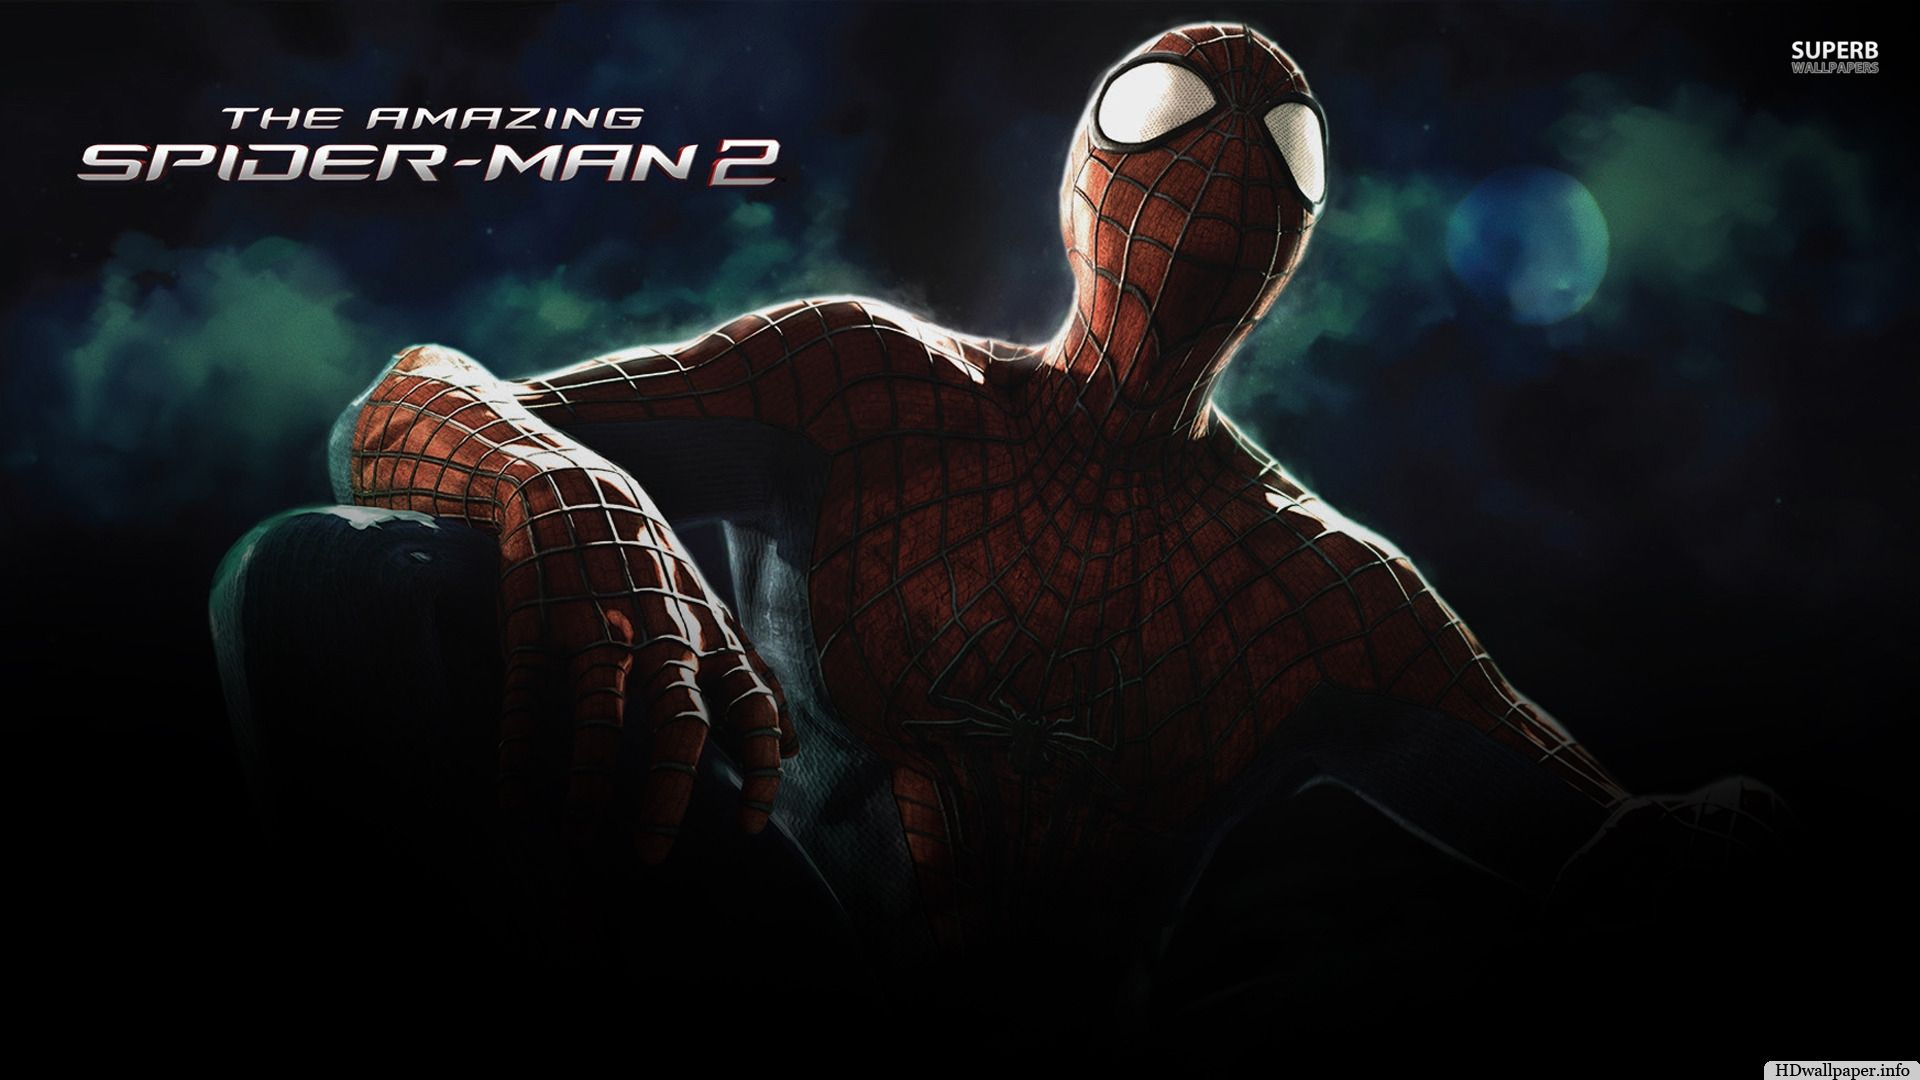 the amazing spider man 2 wallpaper hd 1080p - http://hdwallpaper